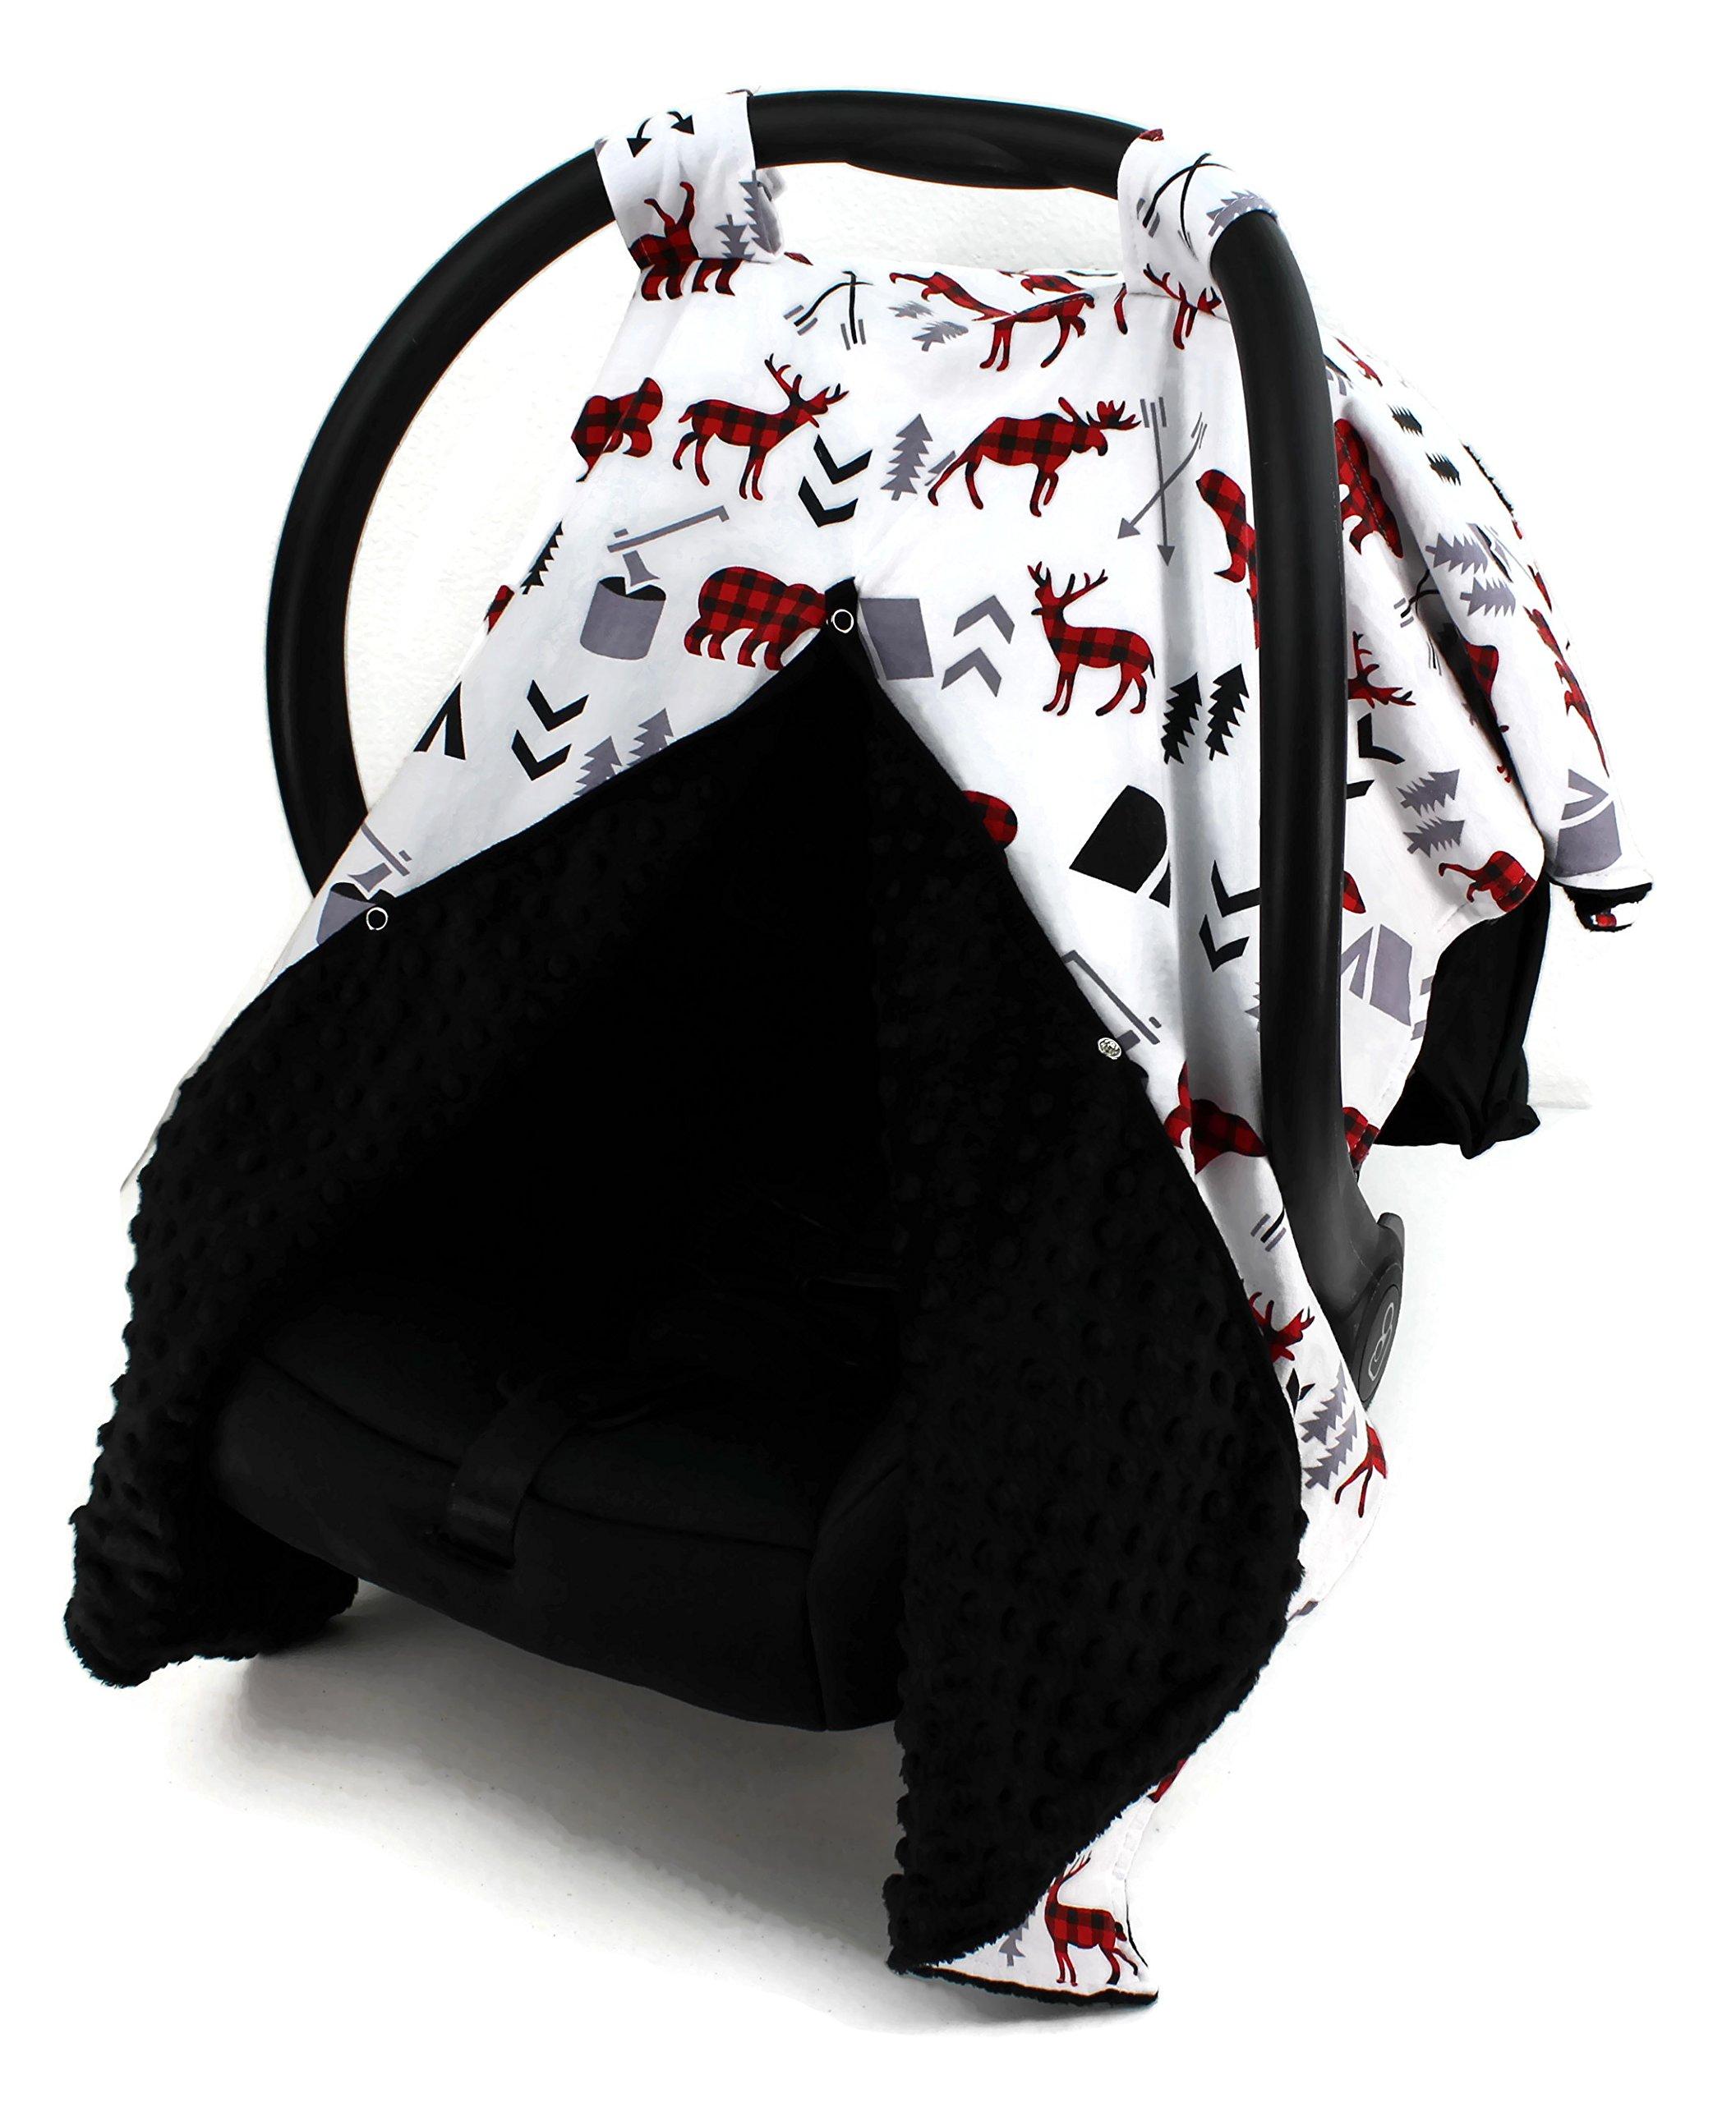 Dear Baby Gear Car Seat Canopy, Woodland Bear Moose Plaid, Minky Black